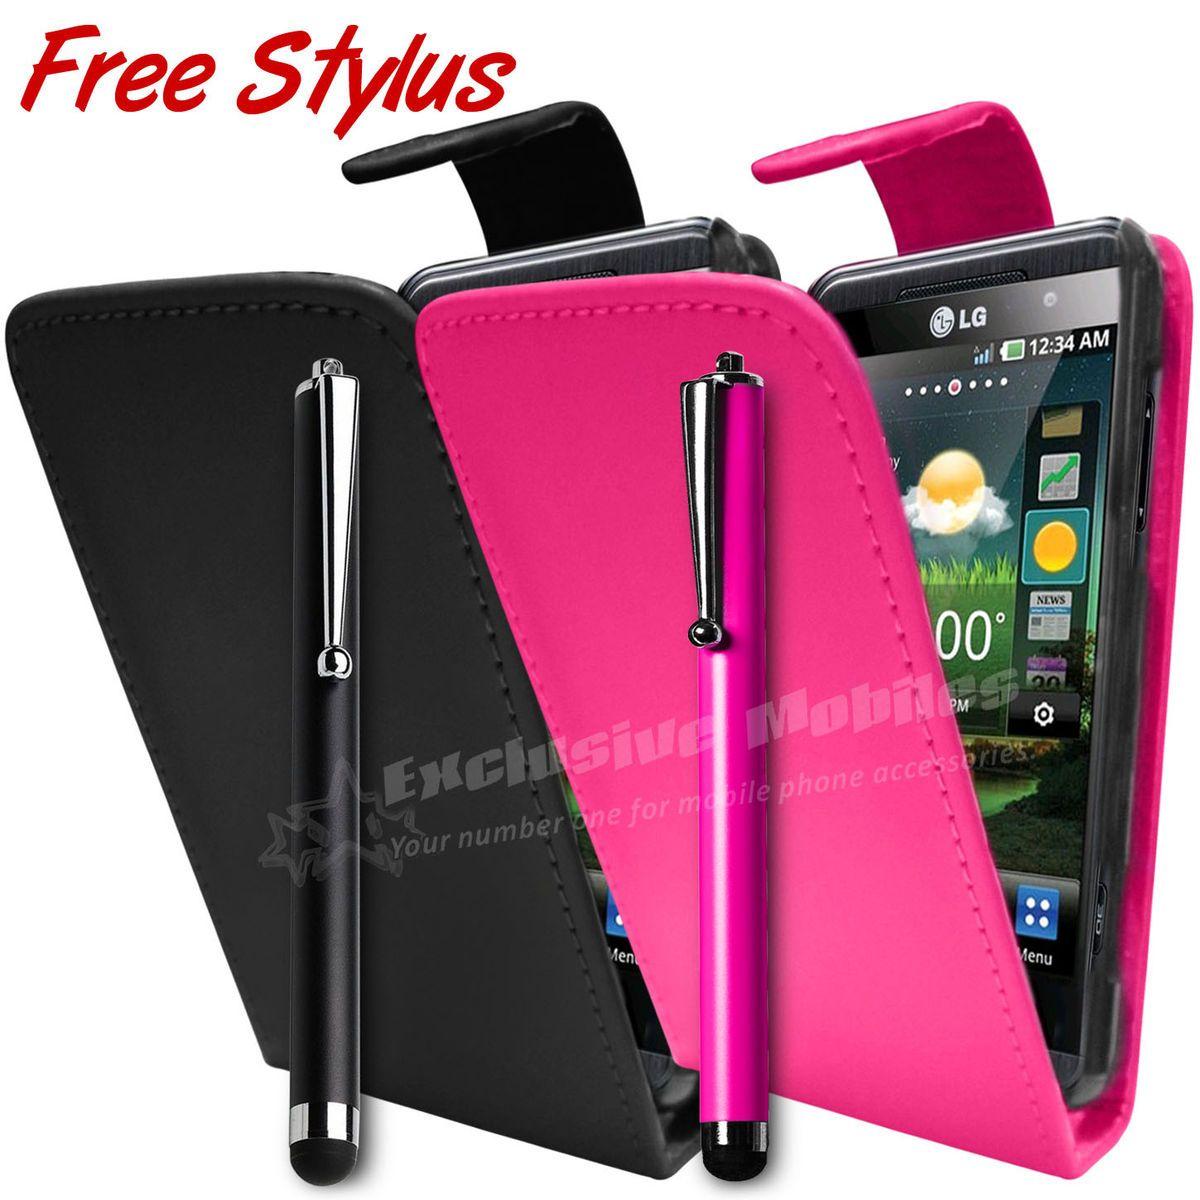 Flip Case Cover Pouch Free Stylus Pen Fits LG Mobile Phones